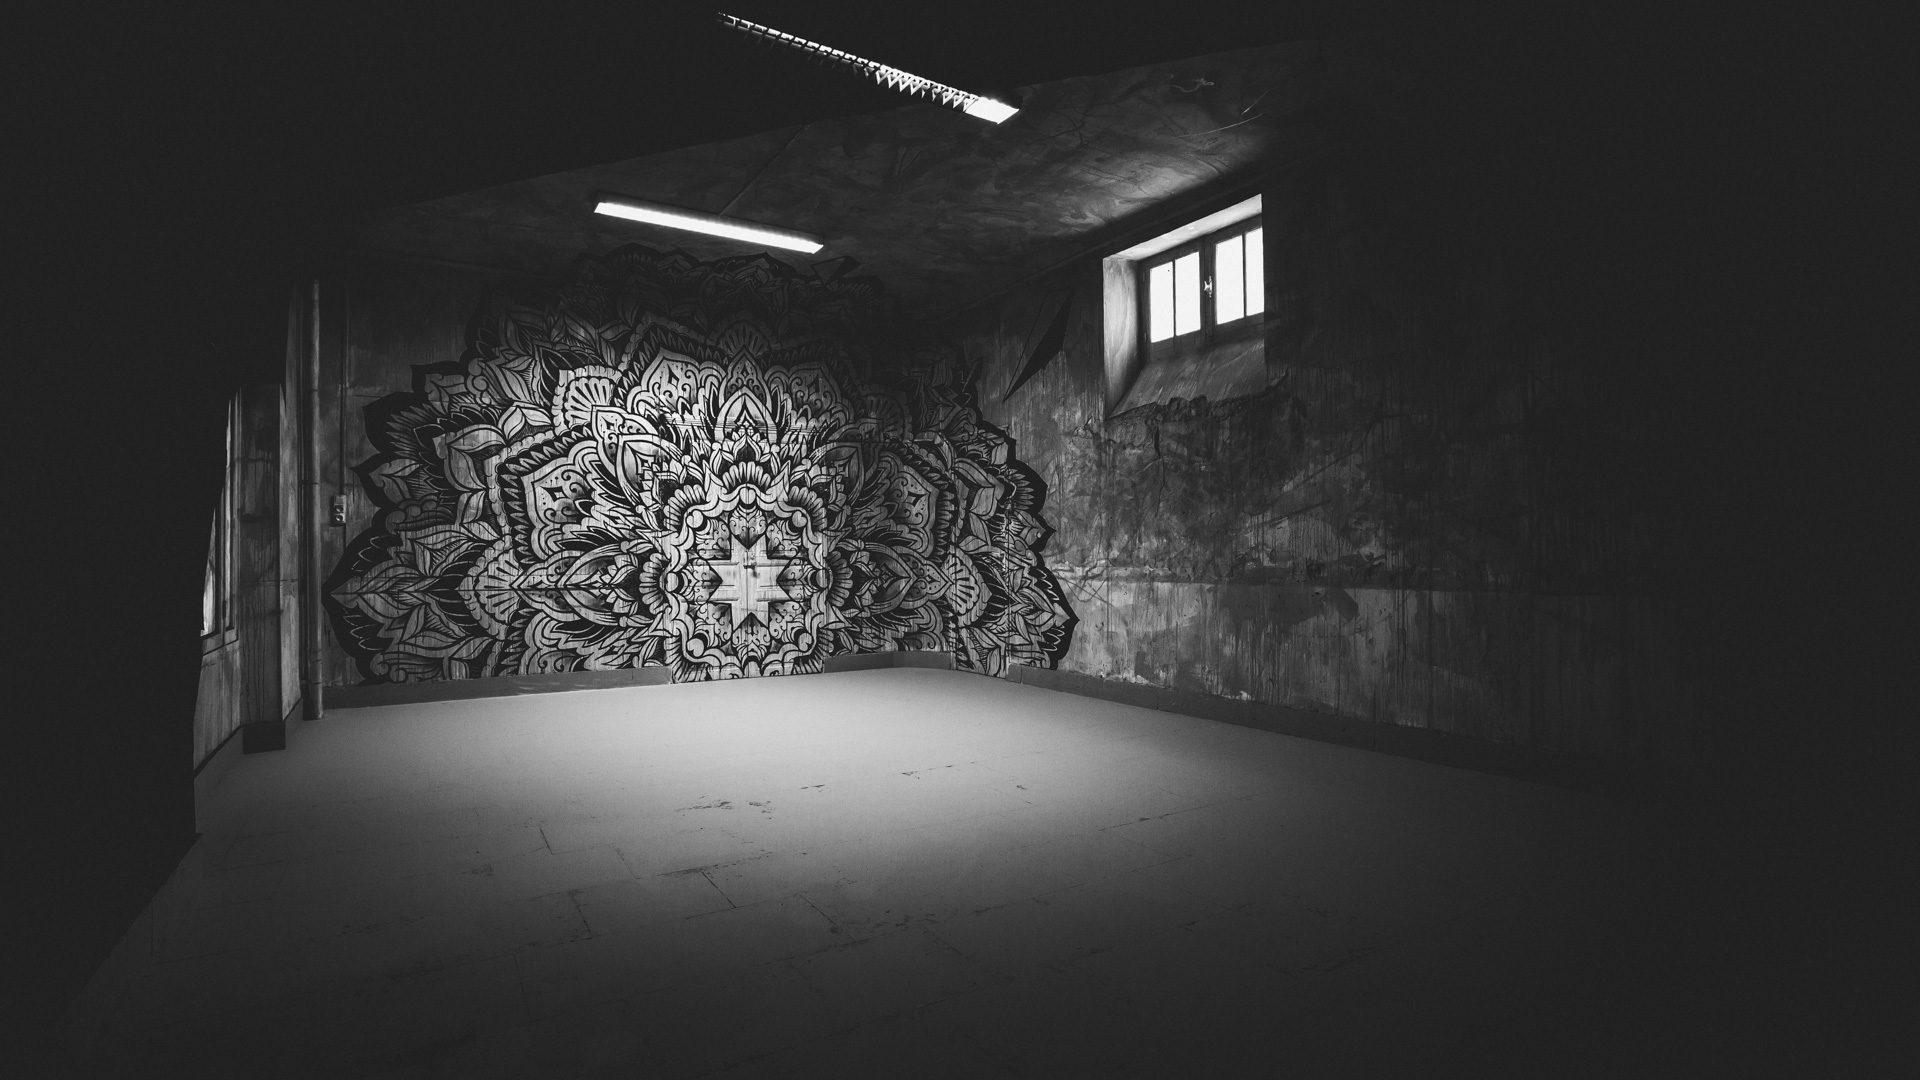 Damien-Dohmen-photographe-XVClasses-38